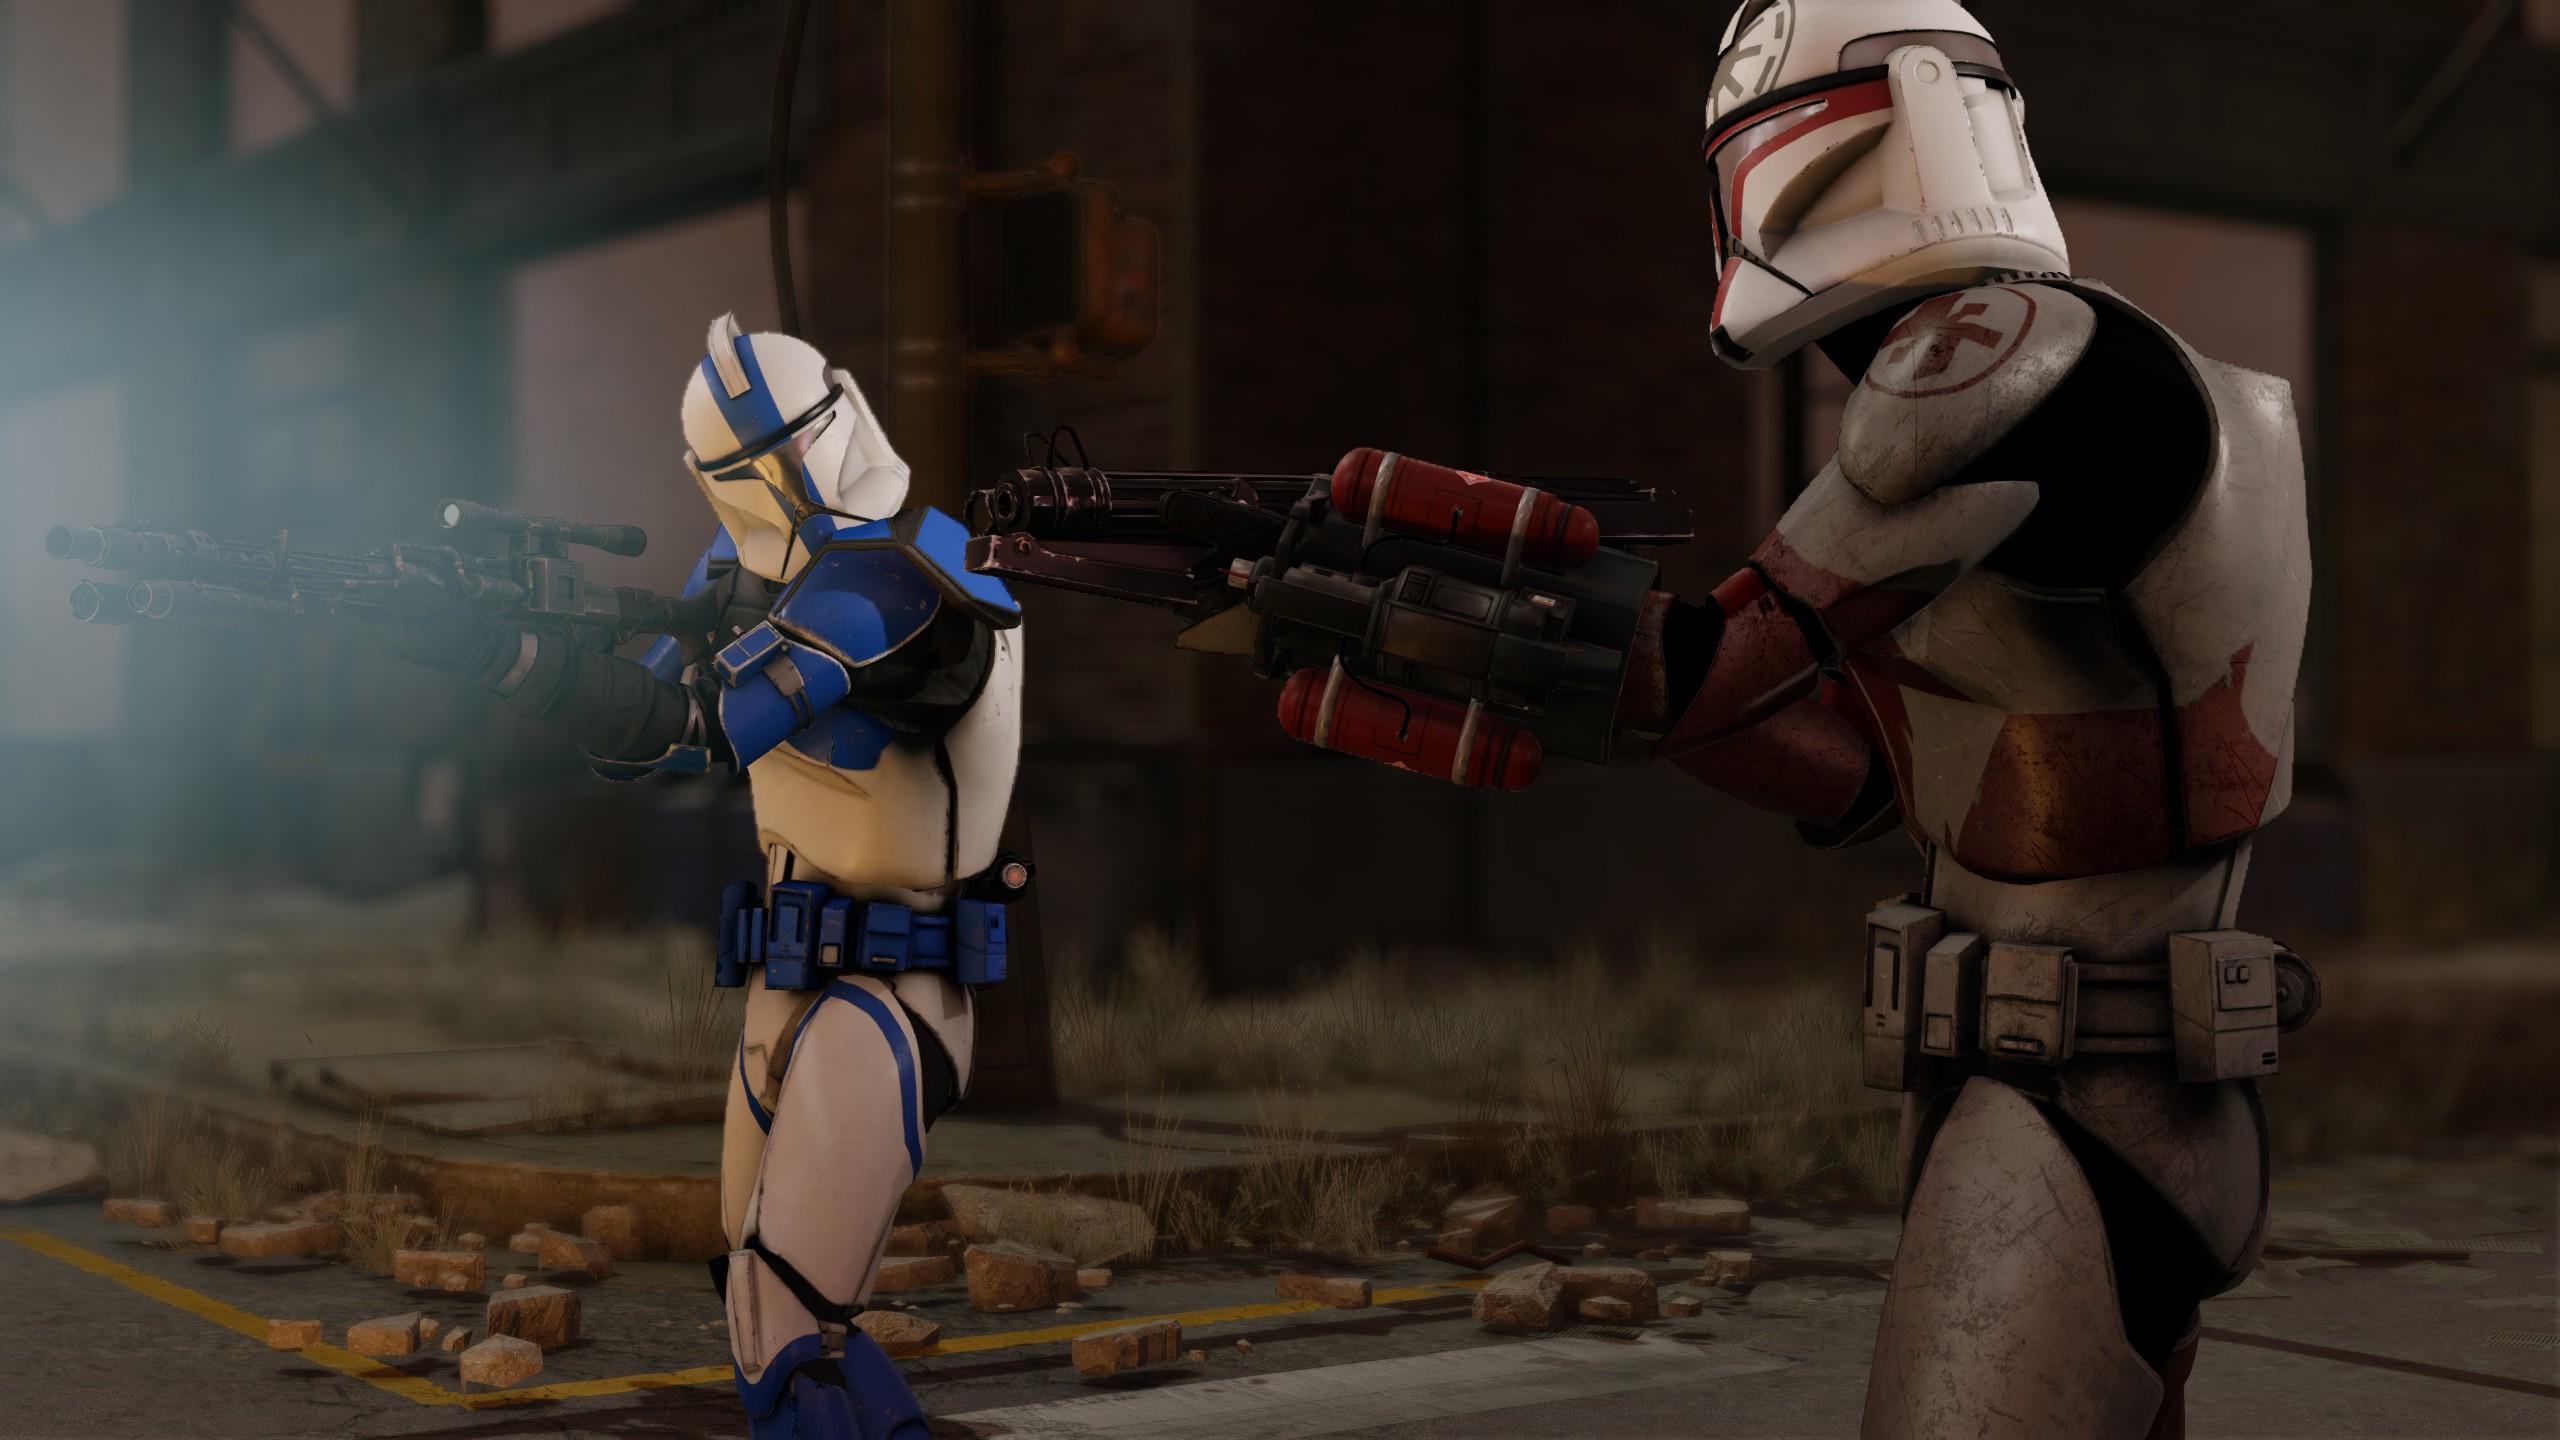 XCOM 2 star wars clones